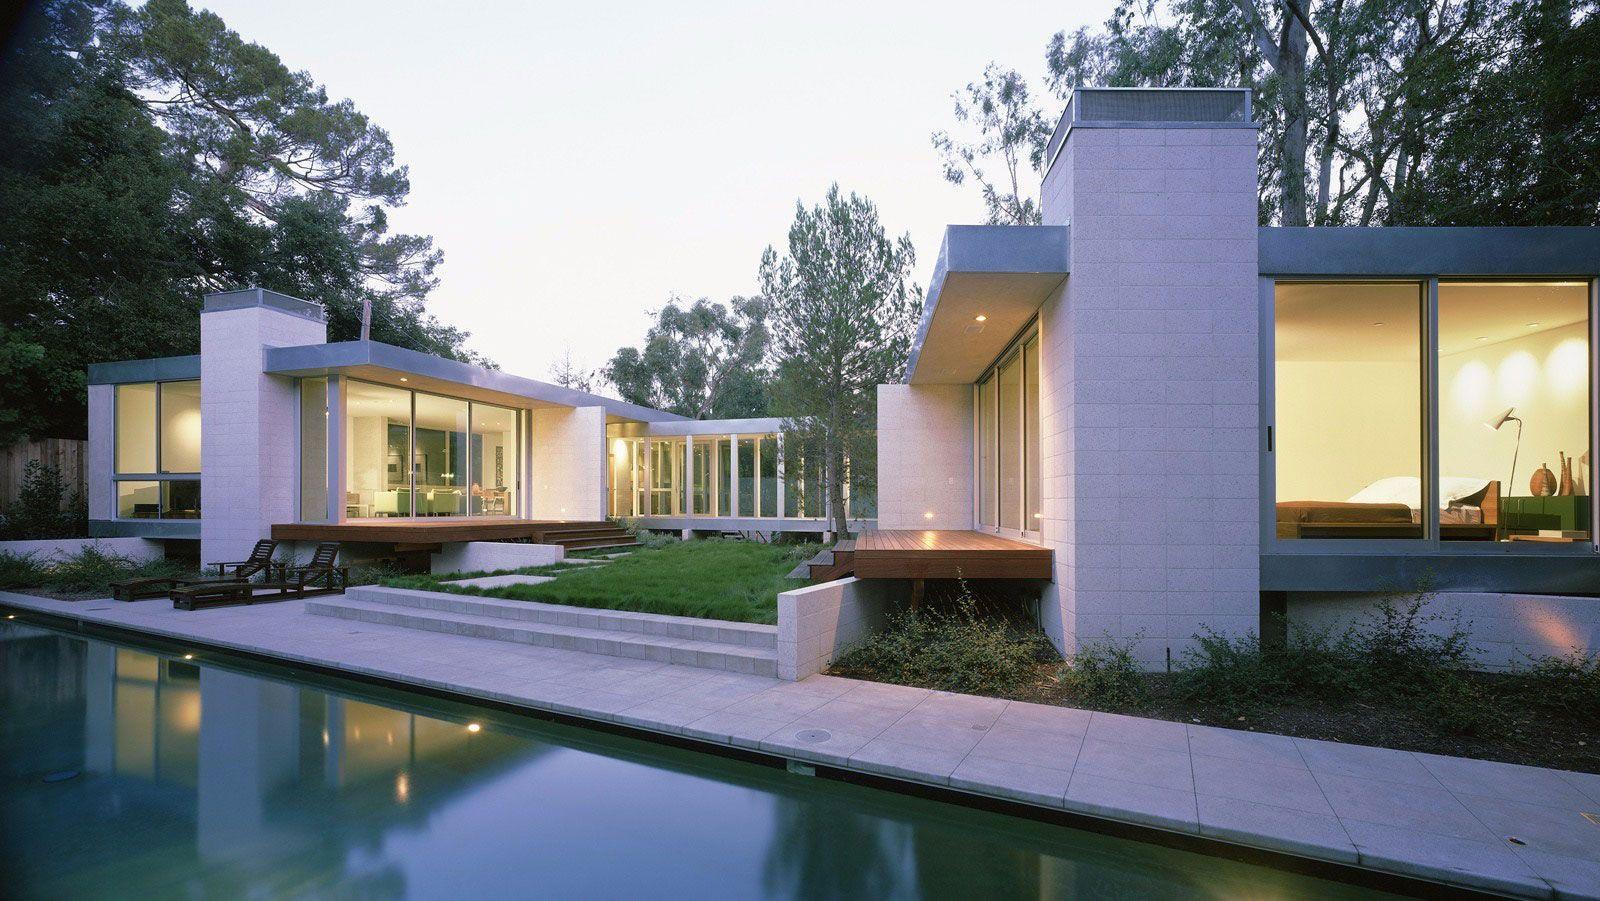 Ward Residence By Marmol Radziner Caandesign